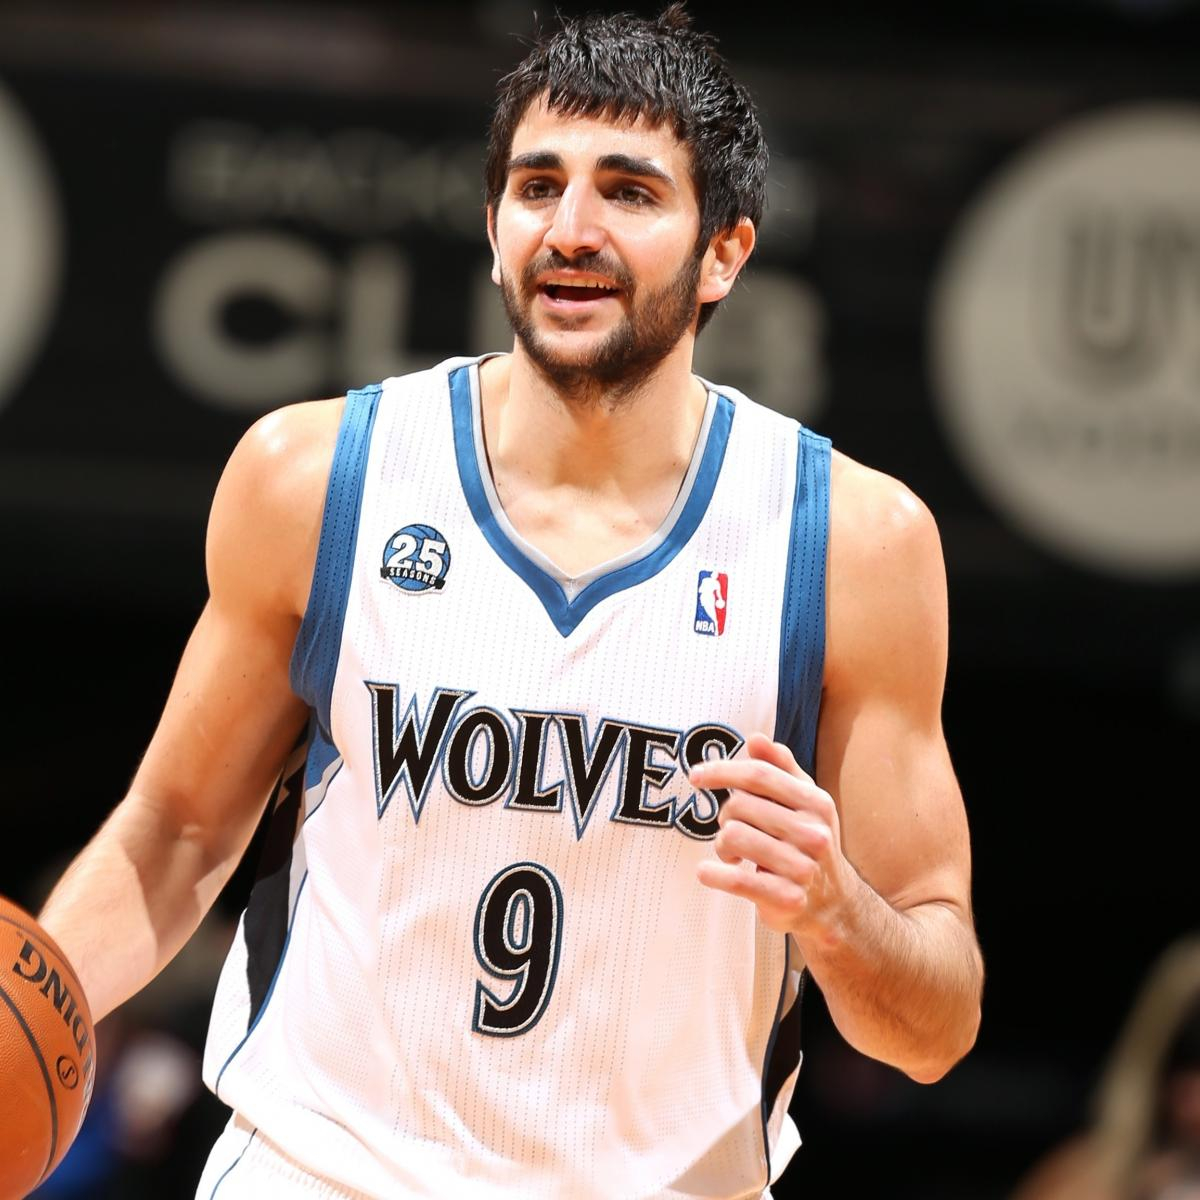 Should Minnesota Timberwolves Consider Trading Ricky Rubio?